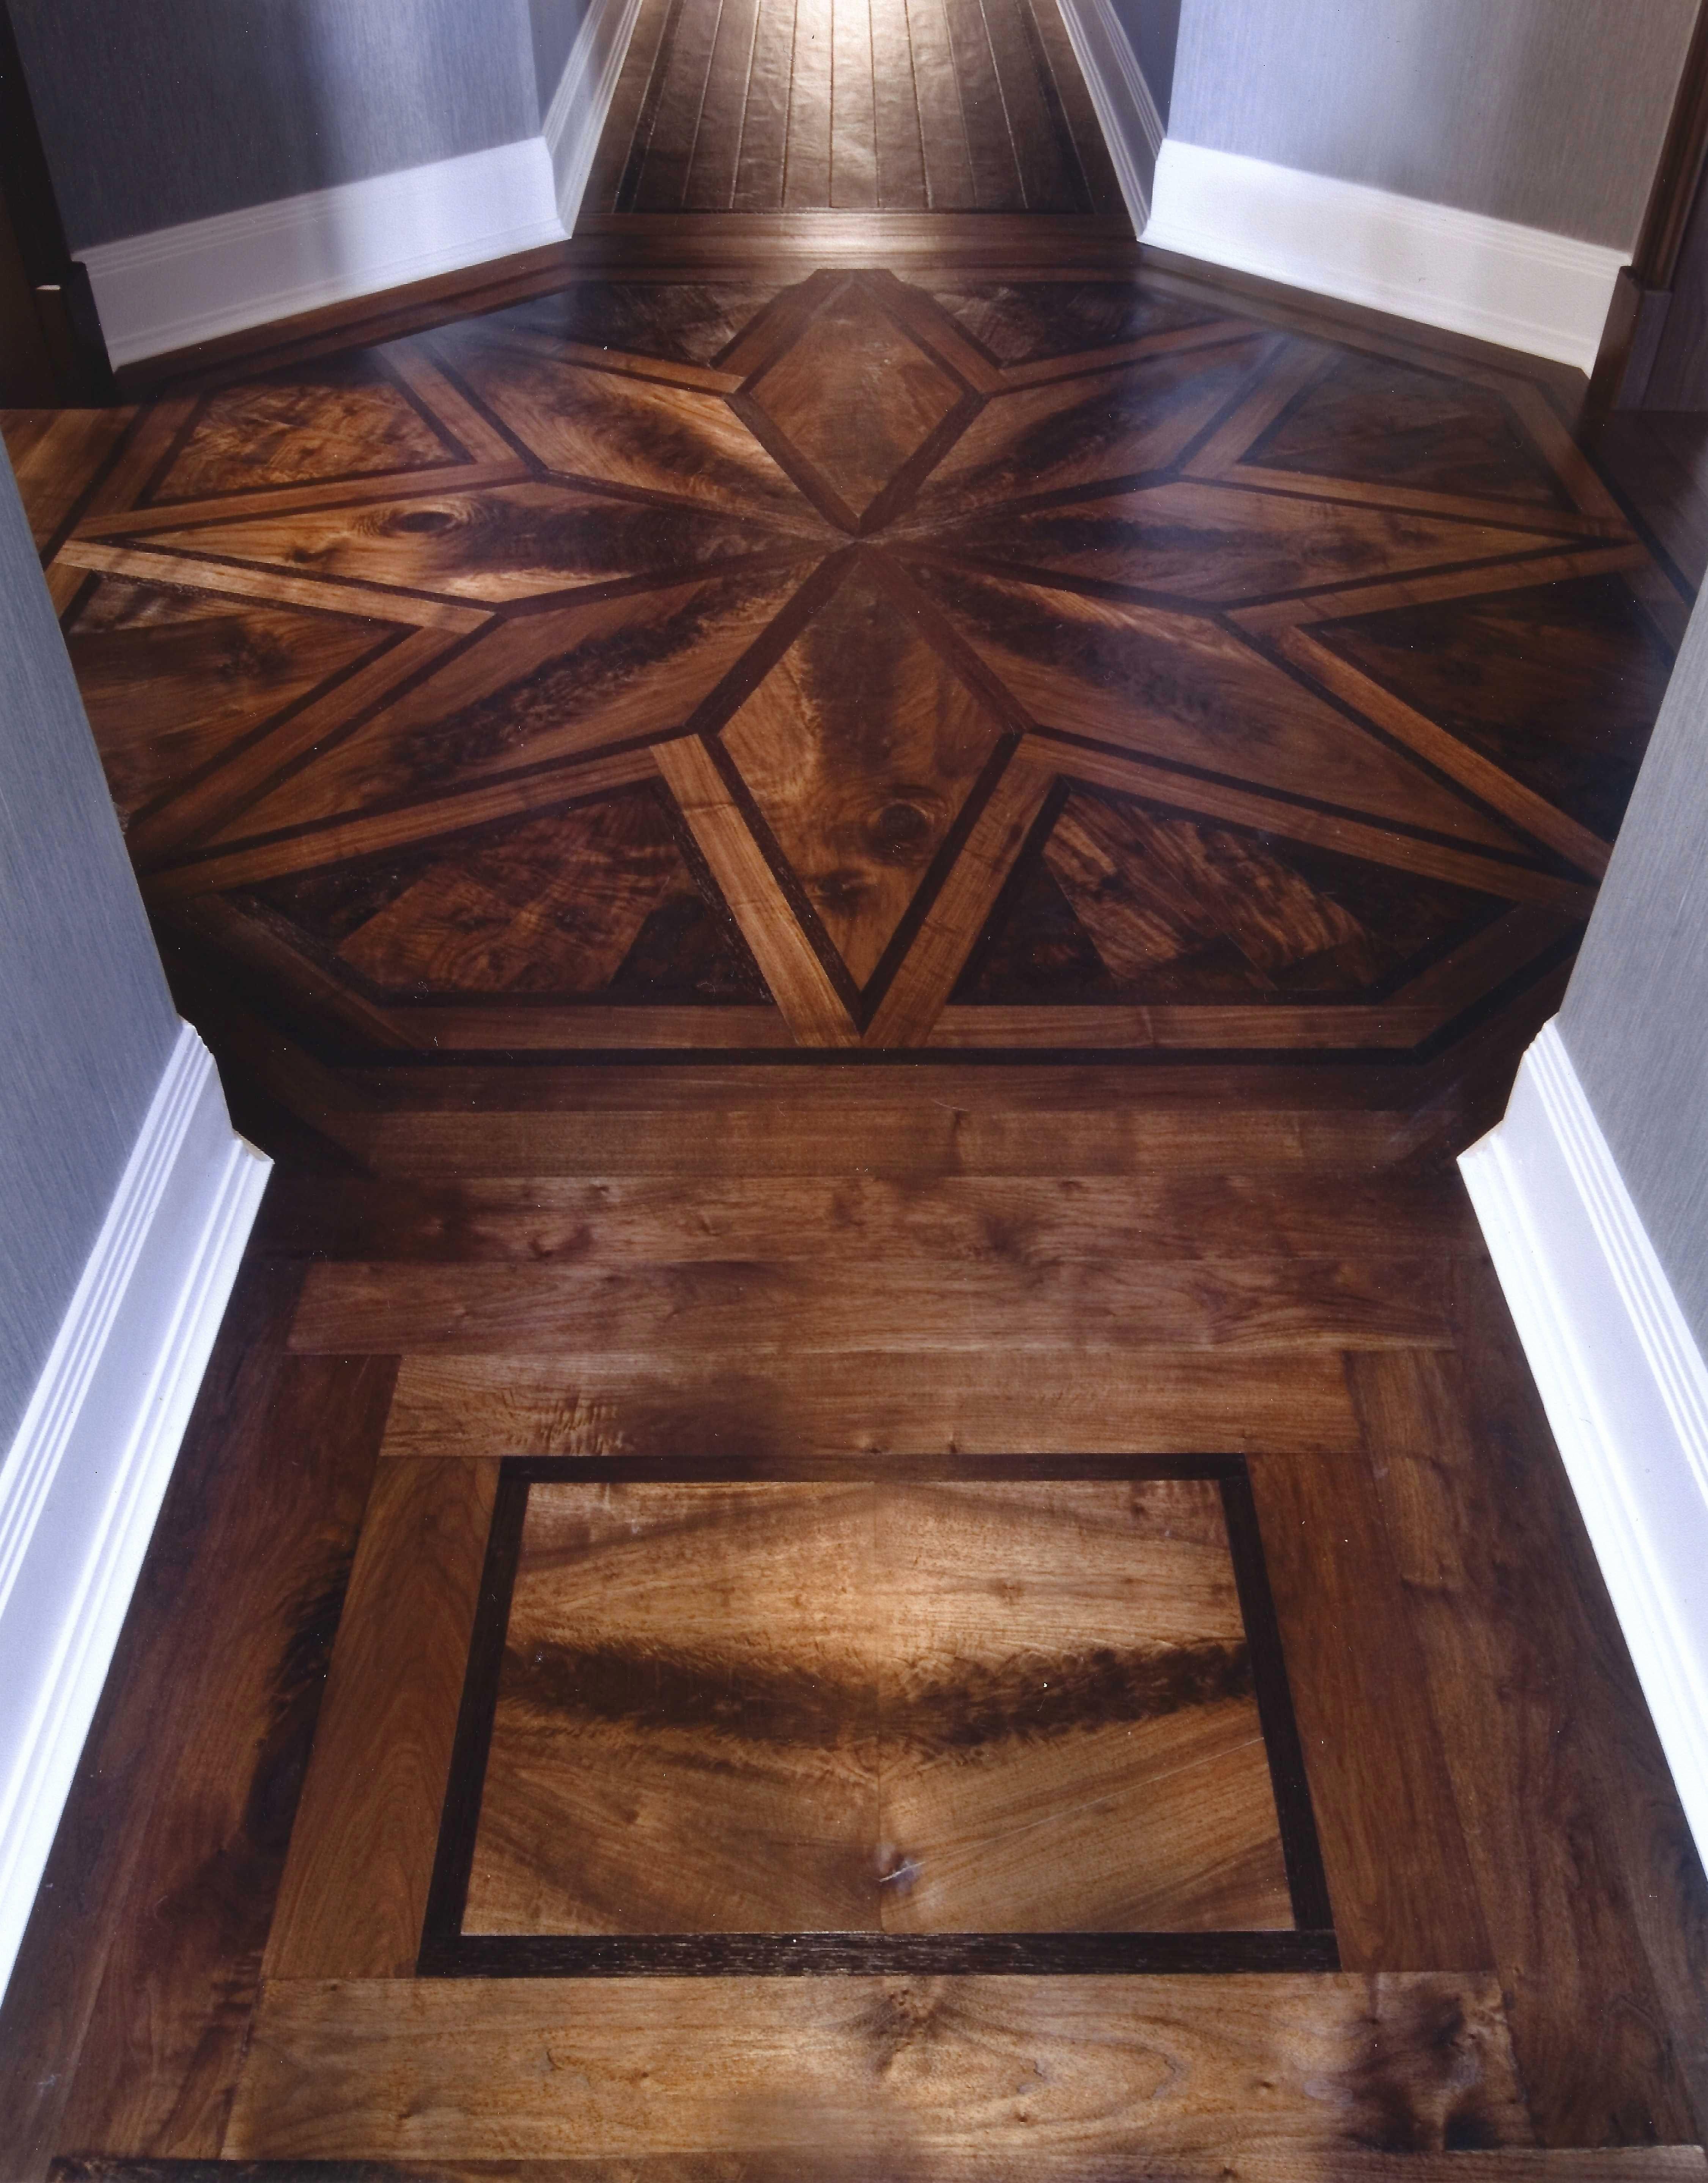 Foyer With Maple Plank Floor With Zebra Wood Inlay Lovely Walnut